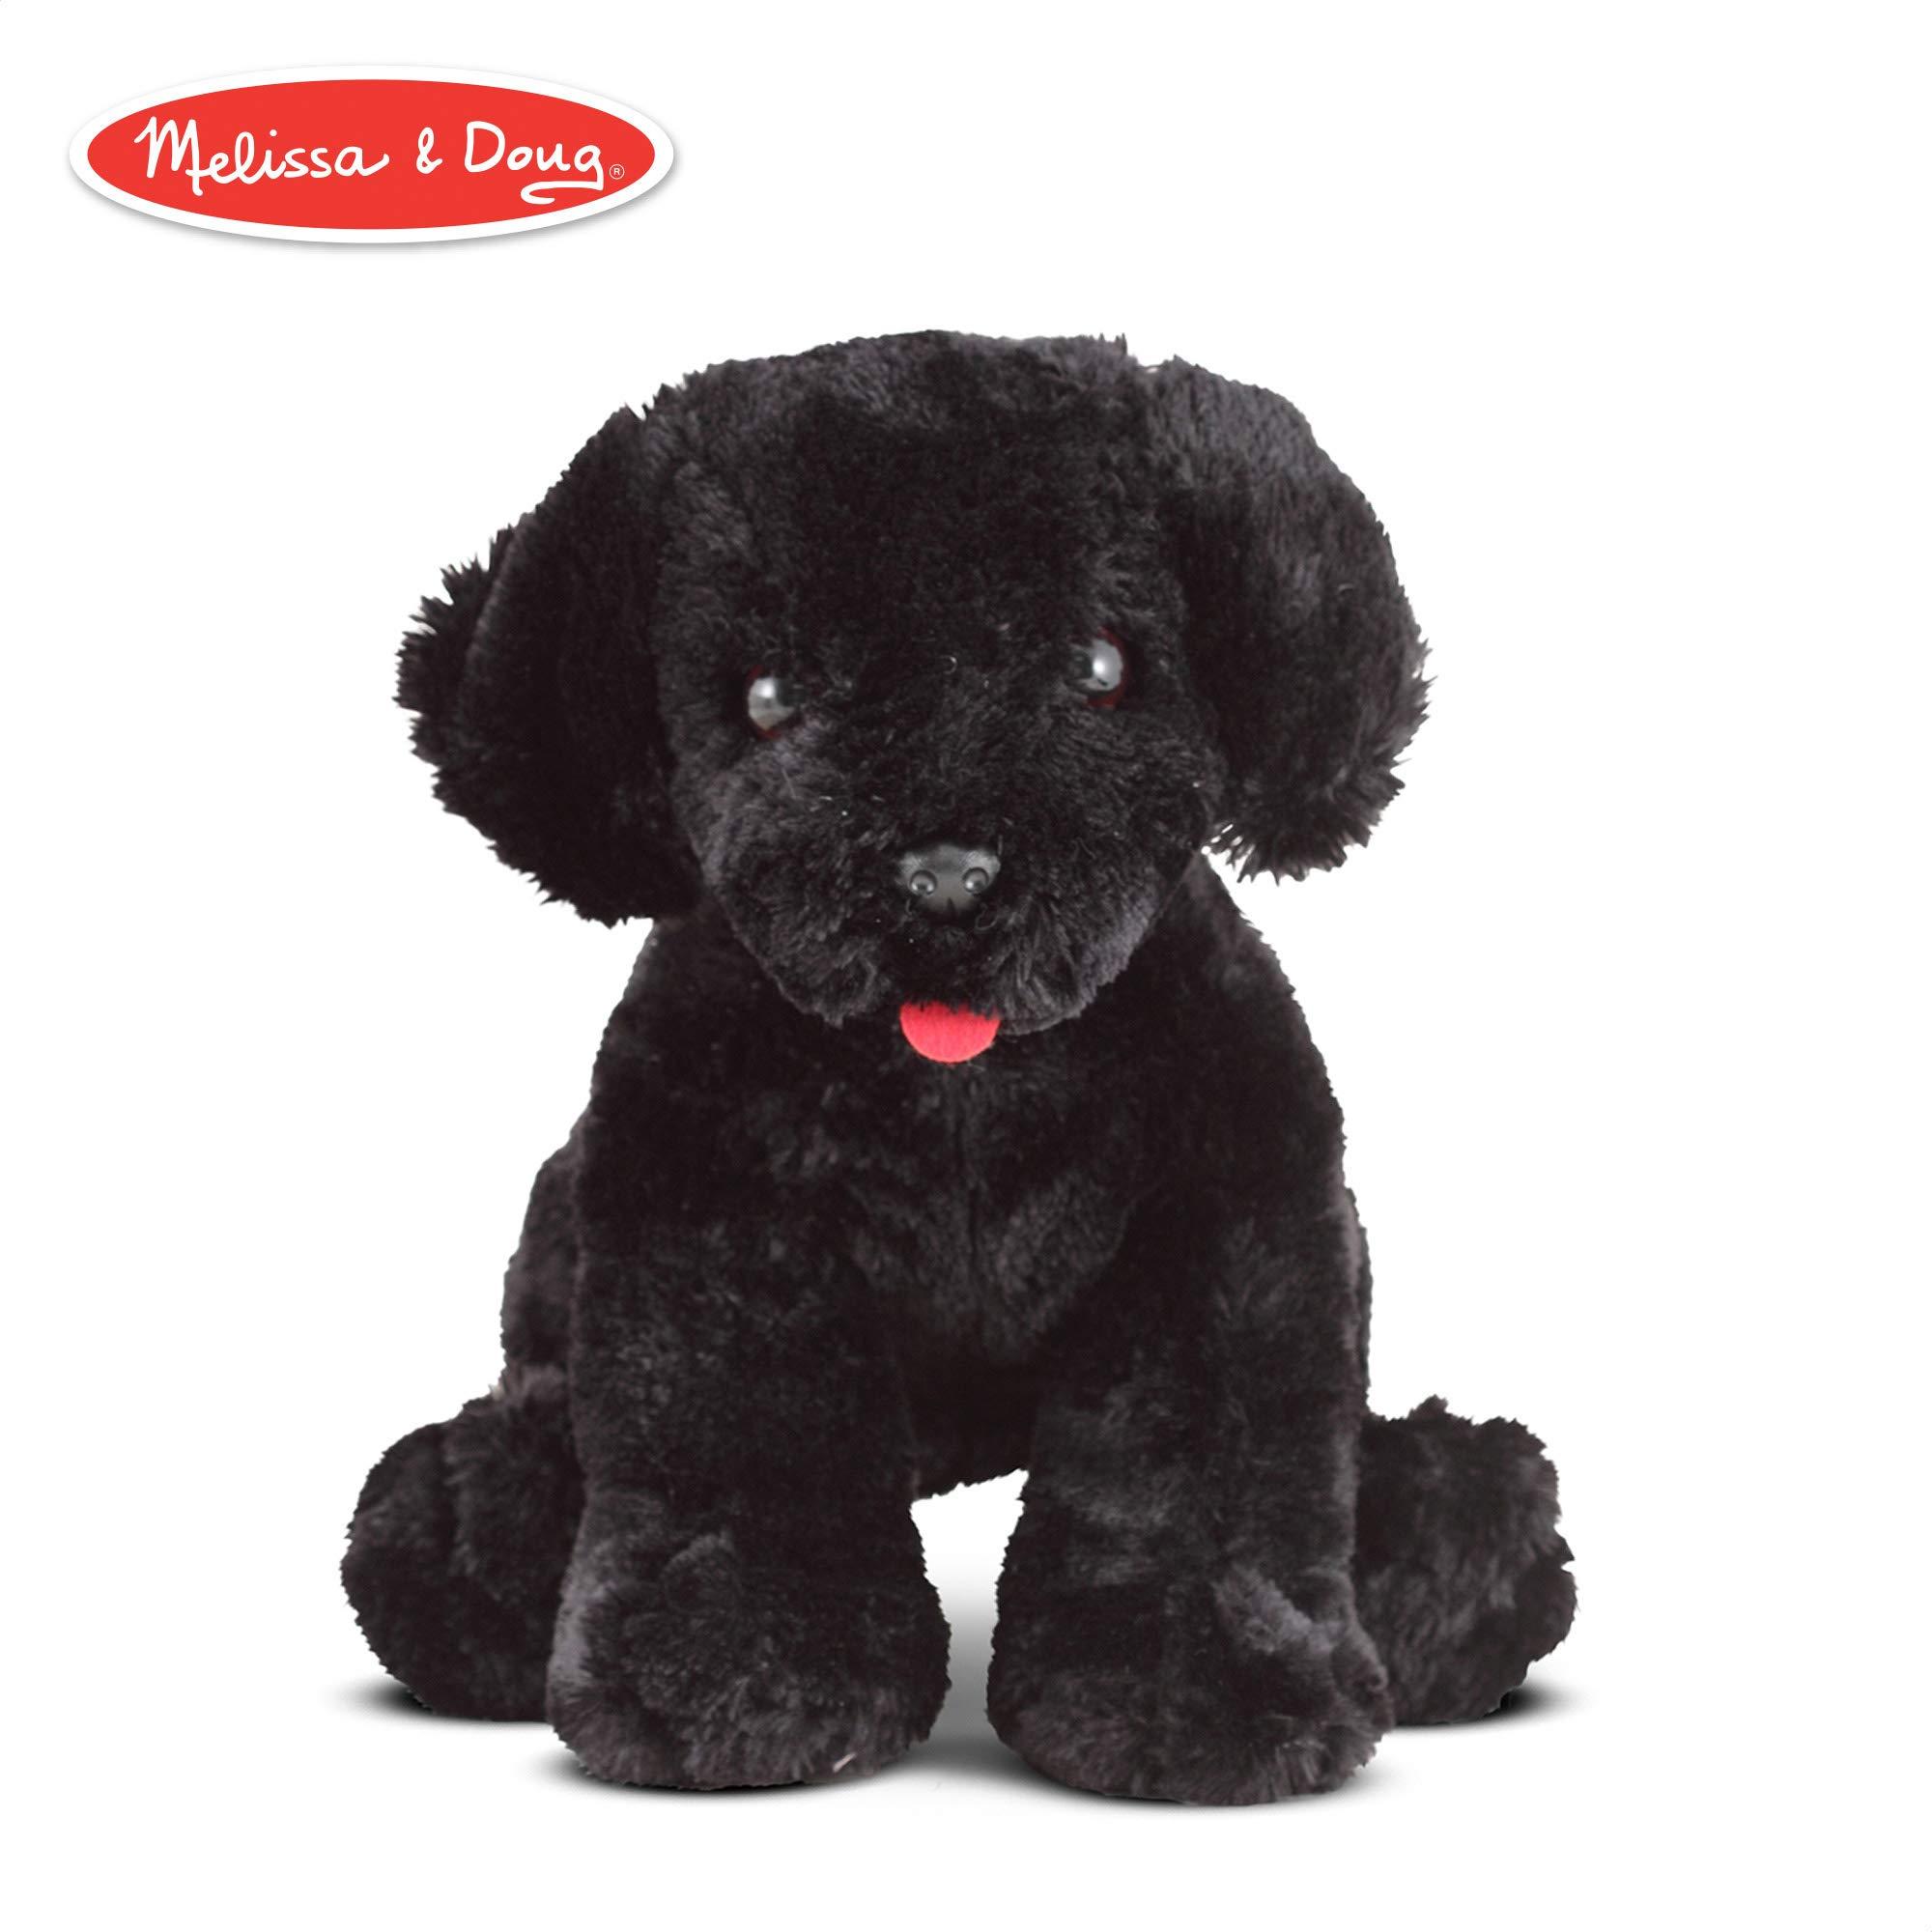 Melissa & Doug Benson Black Lab Puppy Dog (Plush Stuffed Animal, 10 inches) by Melissa & Doug